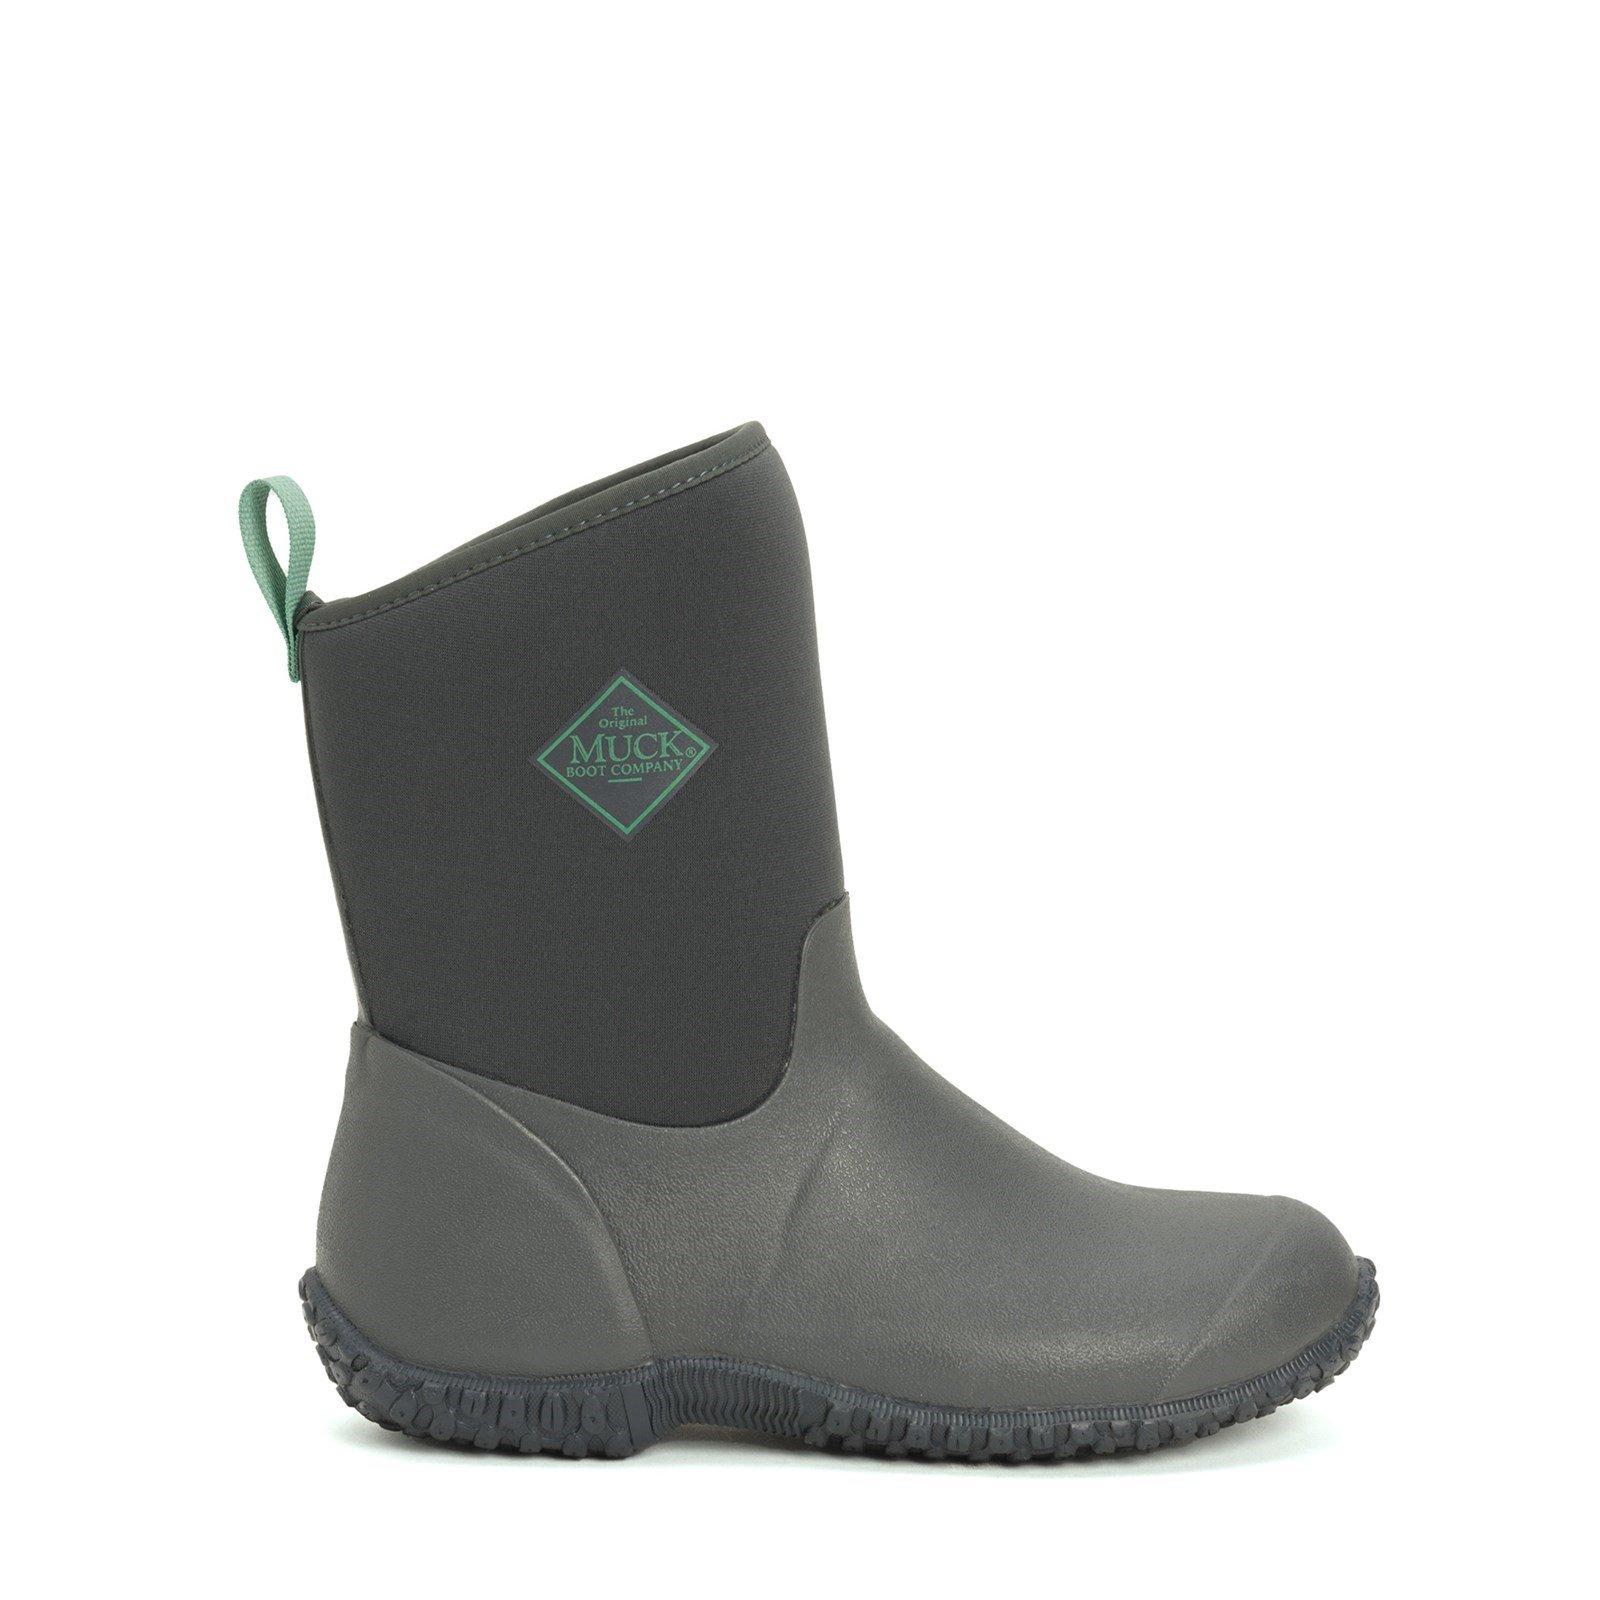 Muck Boots Women's Muckster II Slip On Short Boot Multicolor 28899 - Grey/Print 7